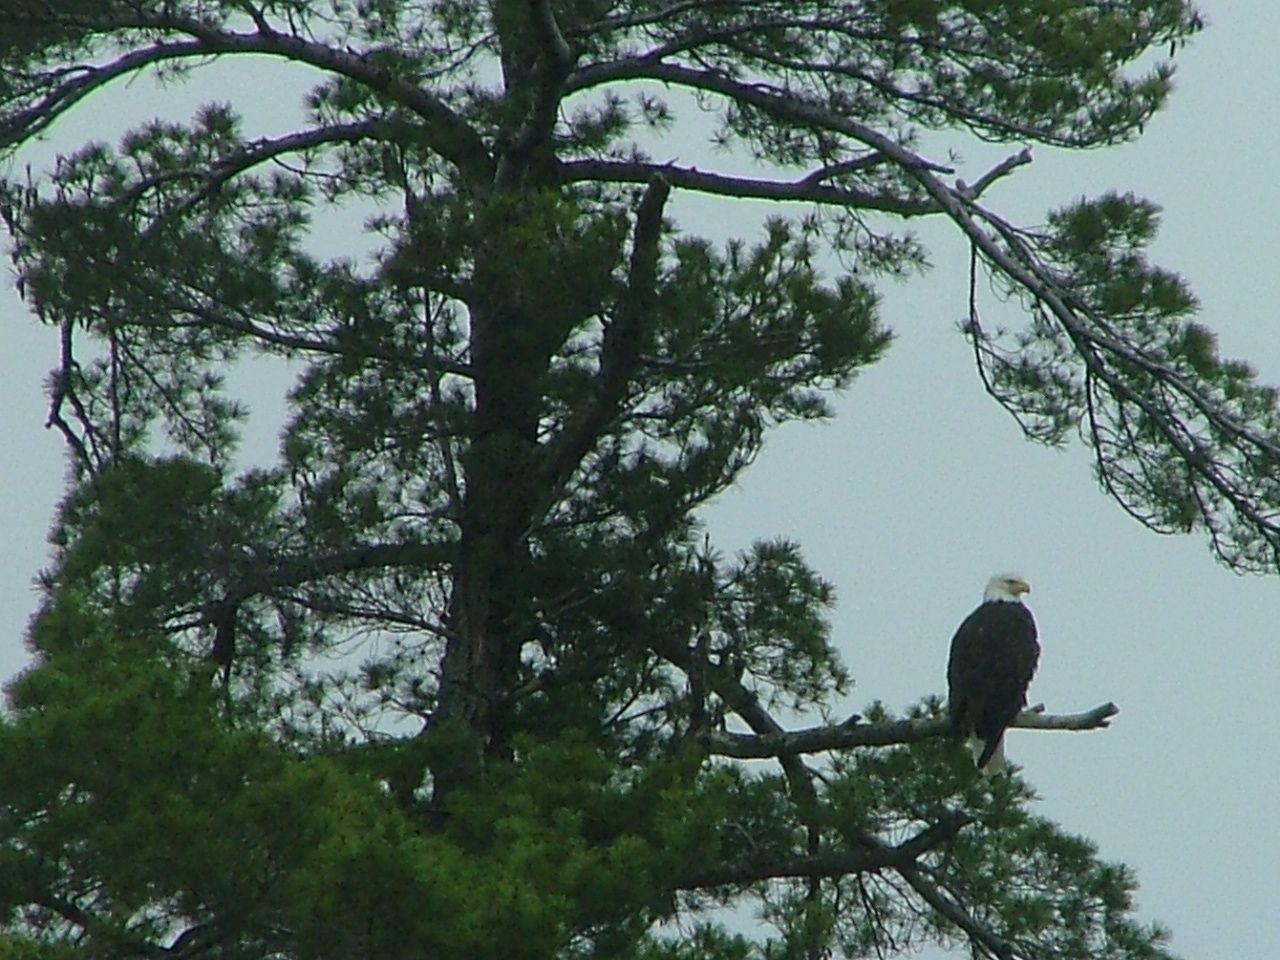 bald eagle on the watch, northwoods